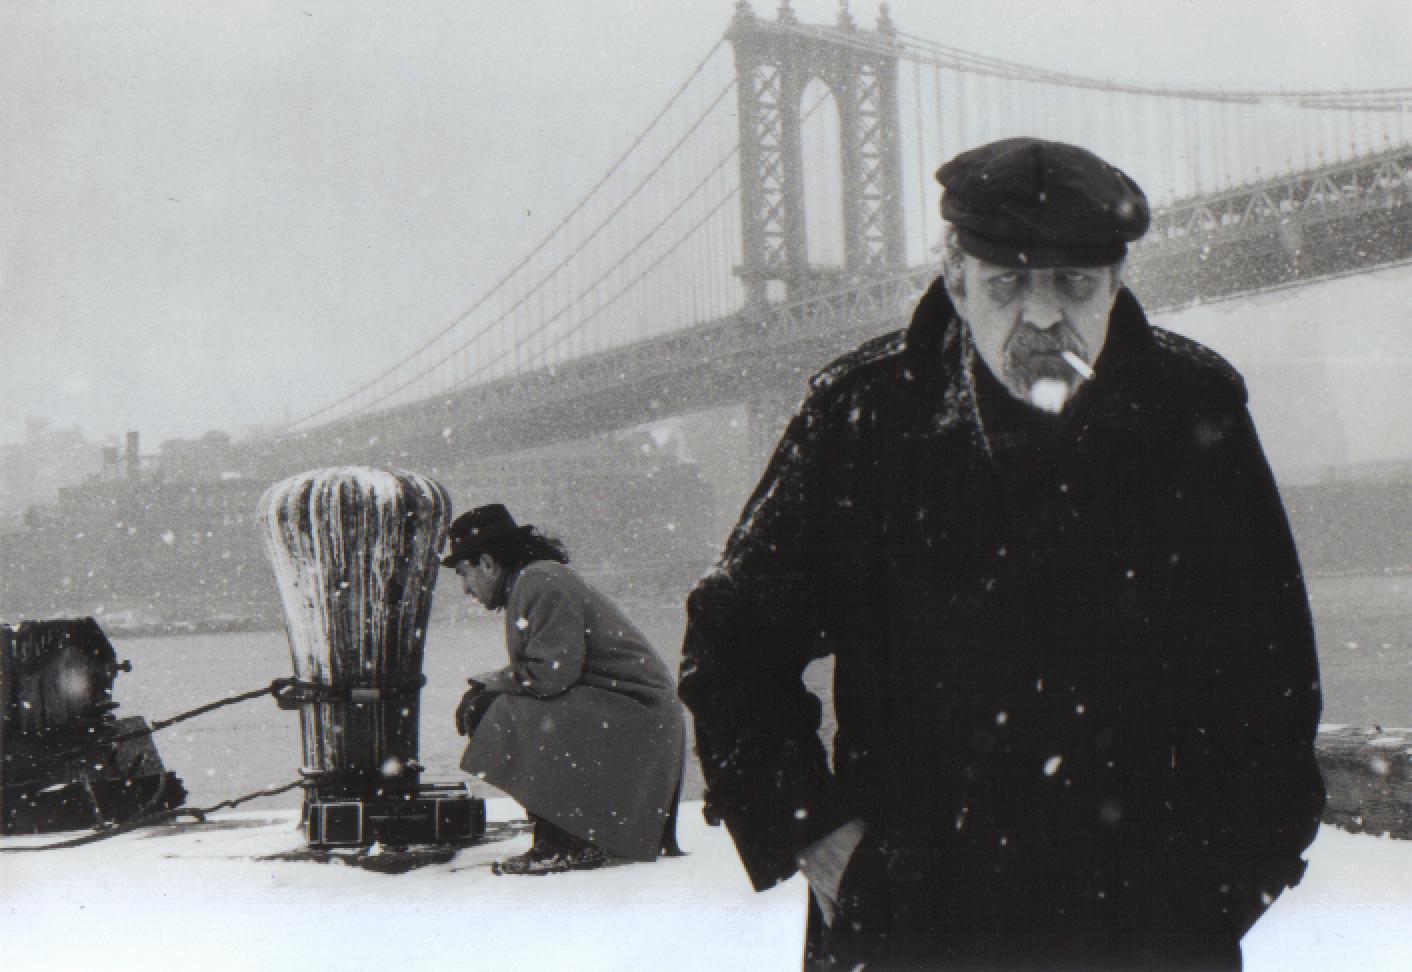 Alan Granville worships at the alter of the Manhattan Bridge, to a disco beat. Featuring Robert Attanasio.